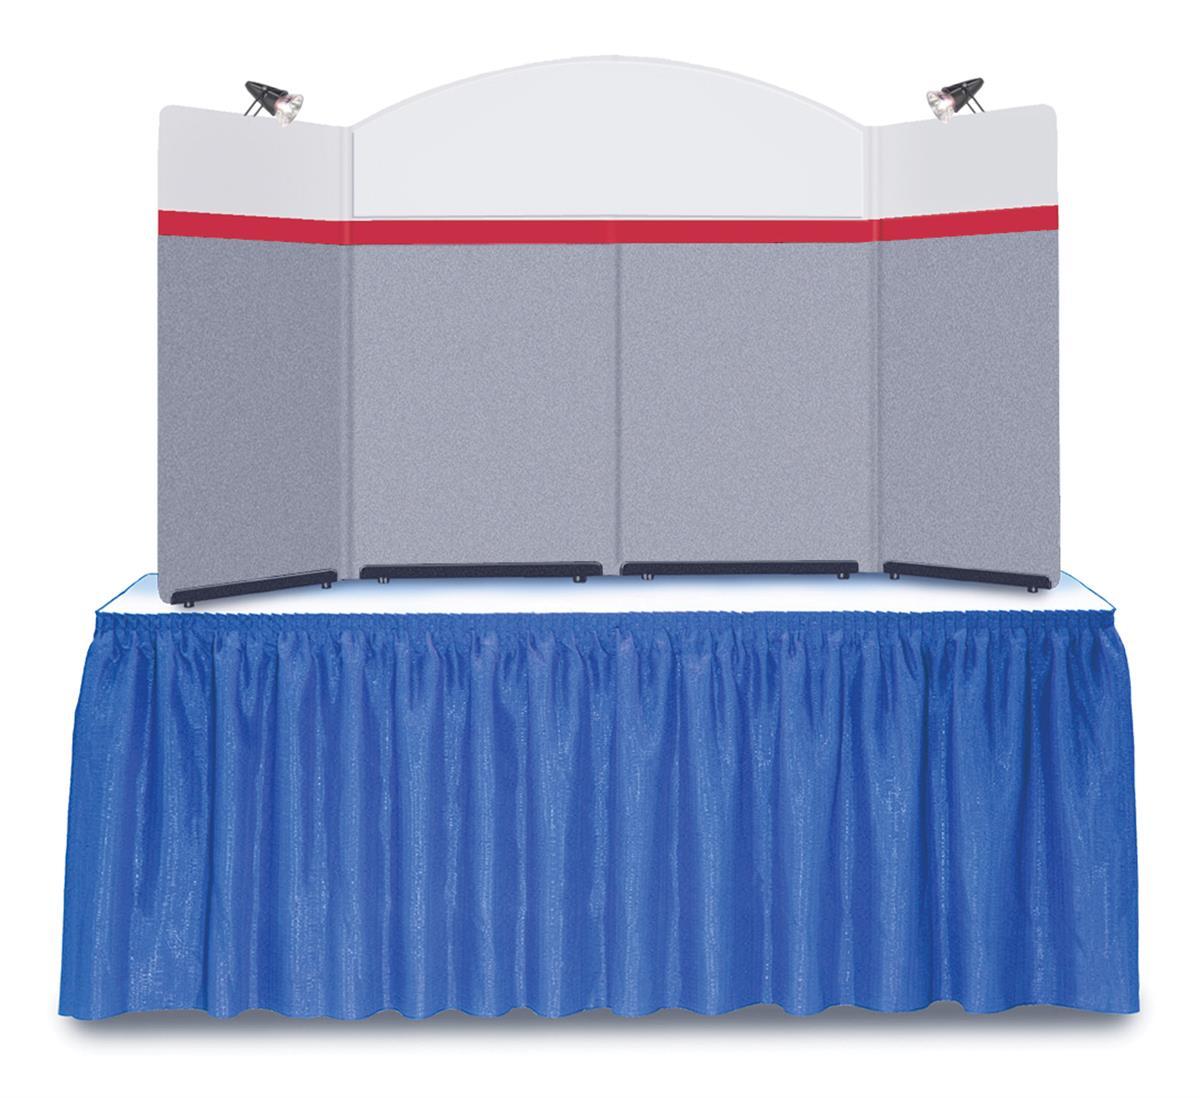 Folding Table Top Displays 88 Quot W Tabletop W Spotlights